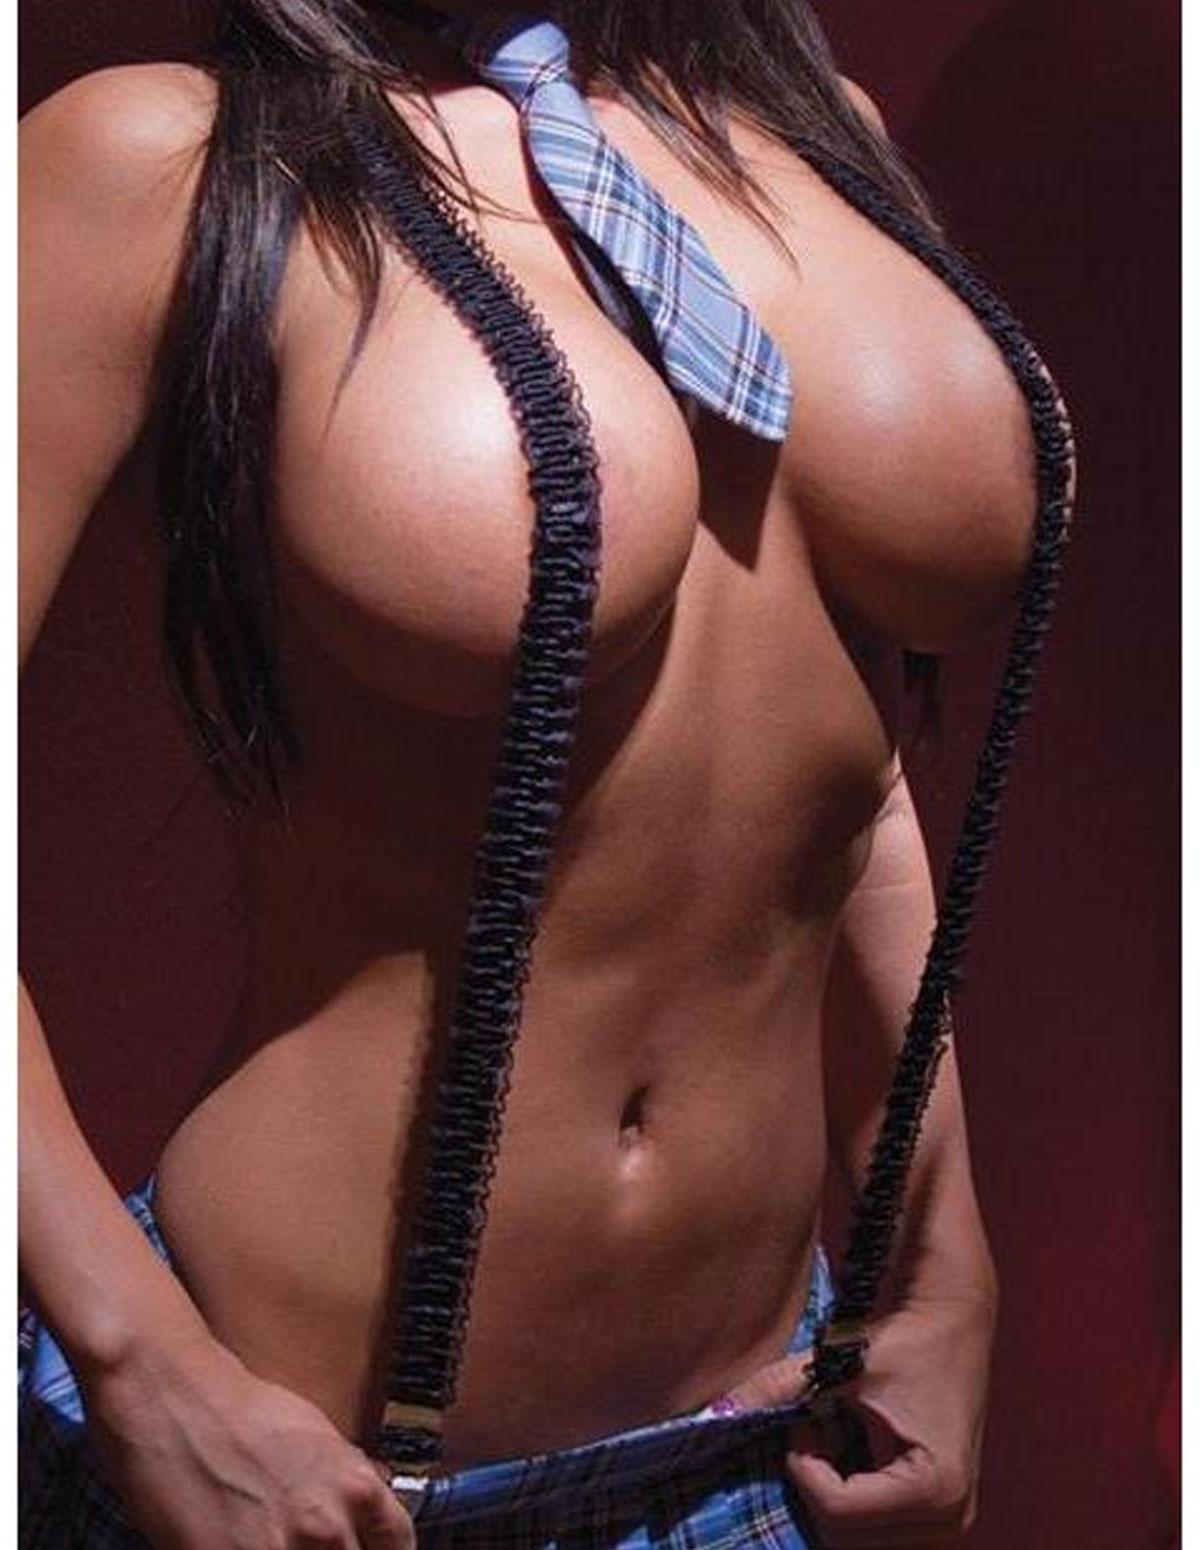 Ruffle Suspenders